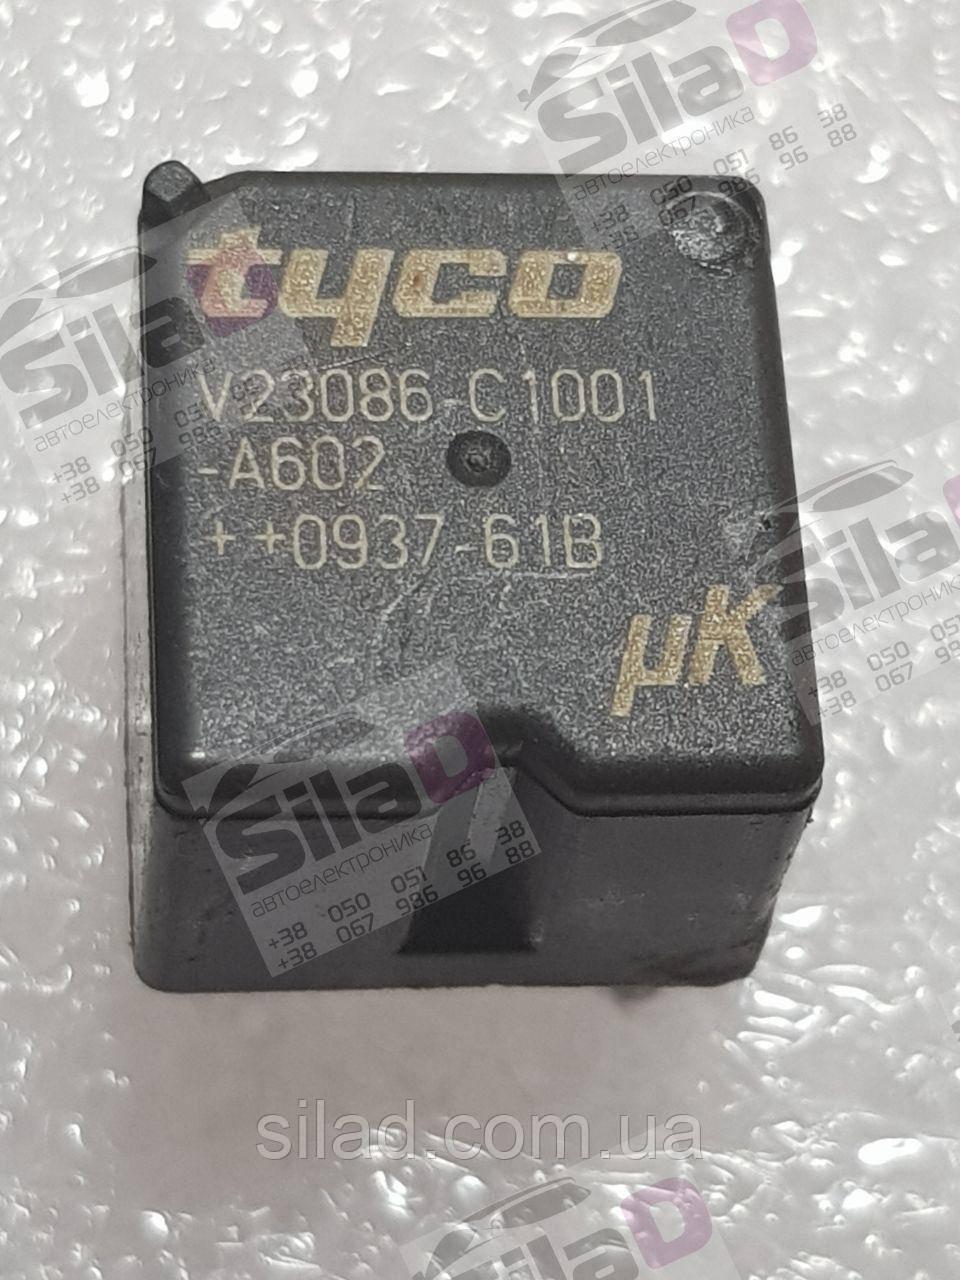 Реле Tyco V23086-C1001-A602 корпус DIP4 Б/У